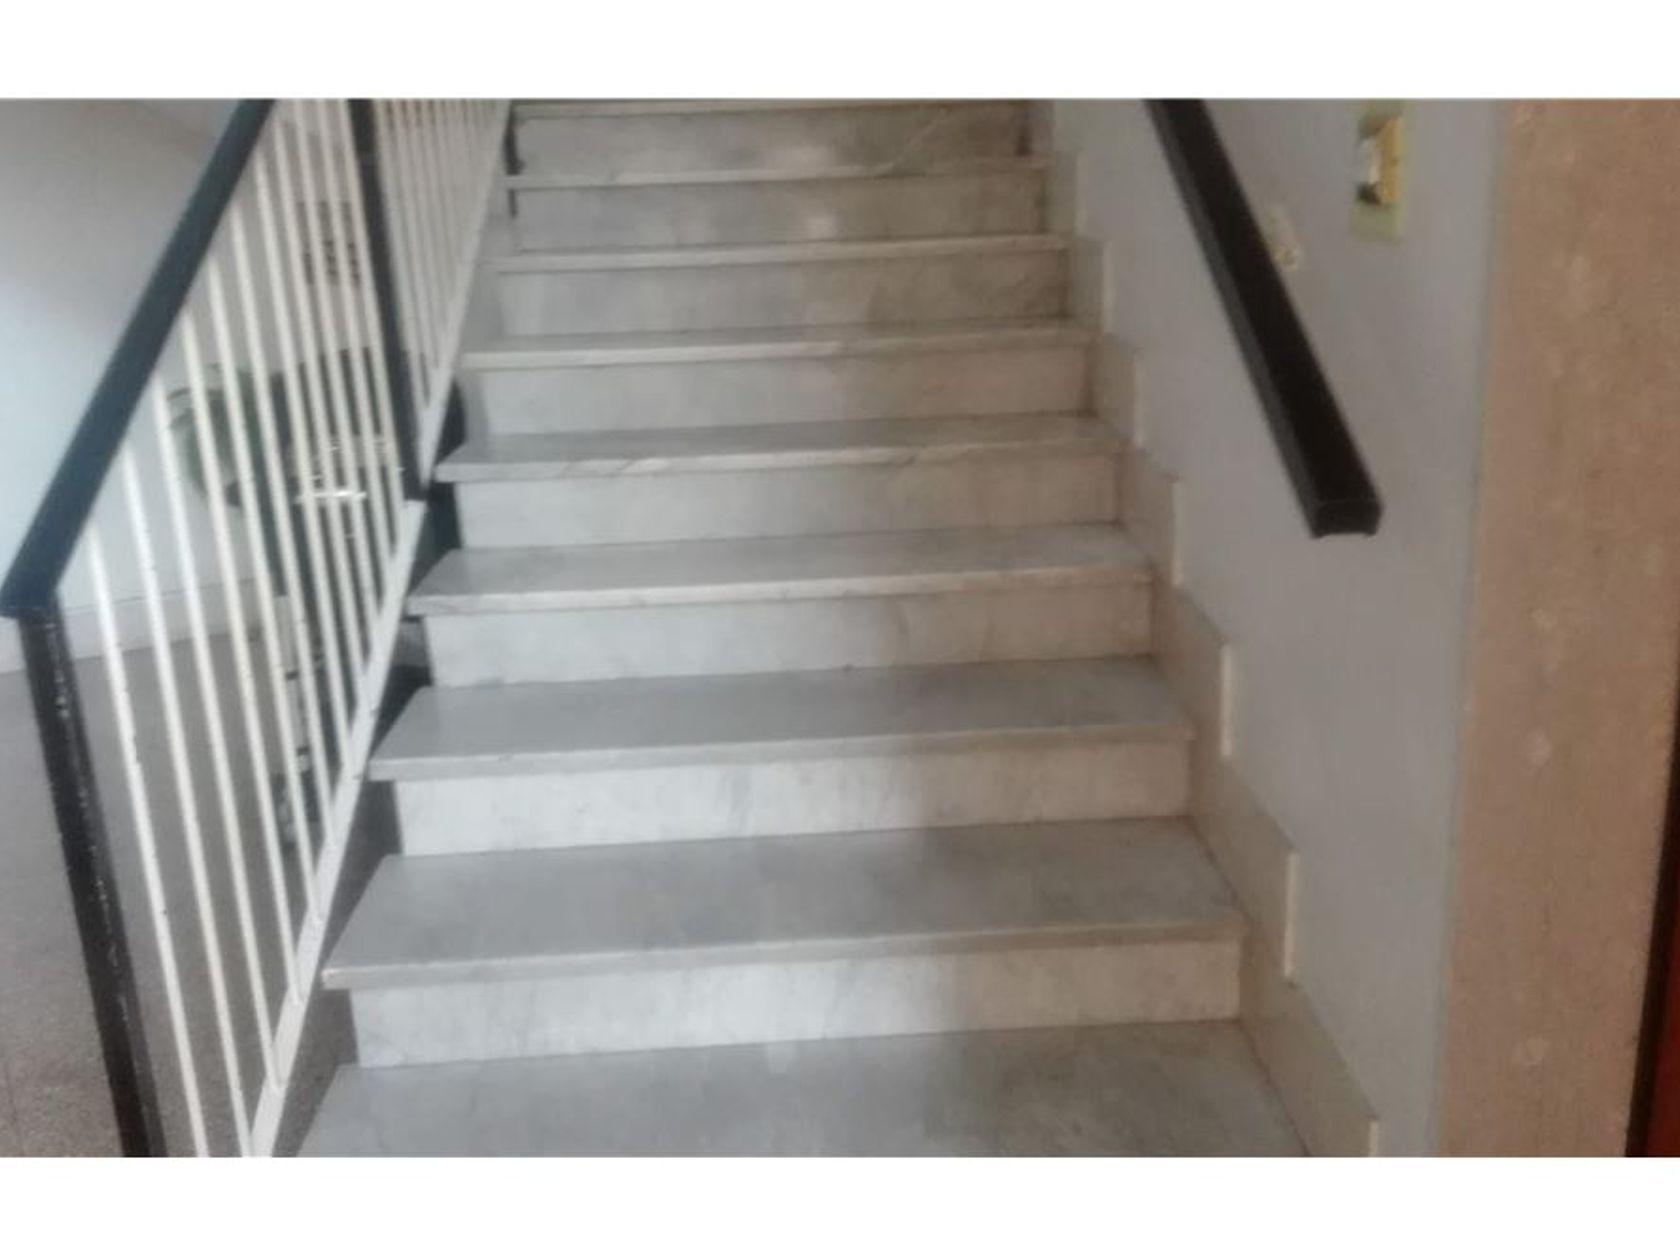 Appartamento Santa Maria, Catanzaro, CZ Vendita - Foto 3